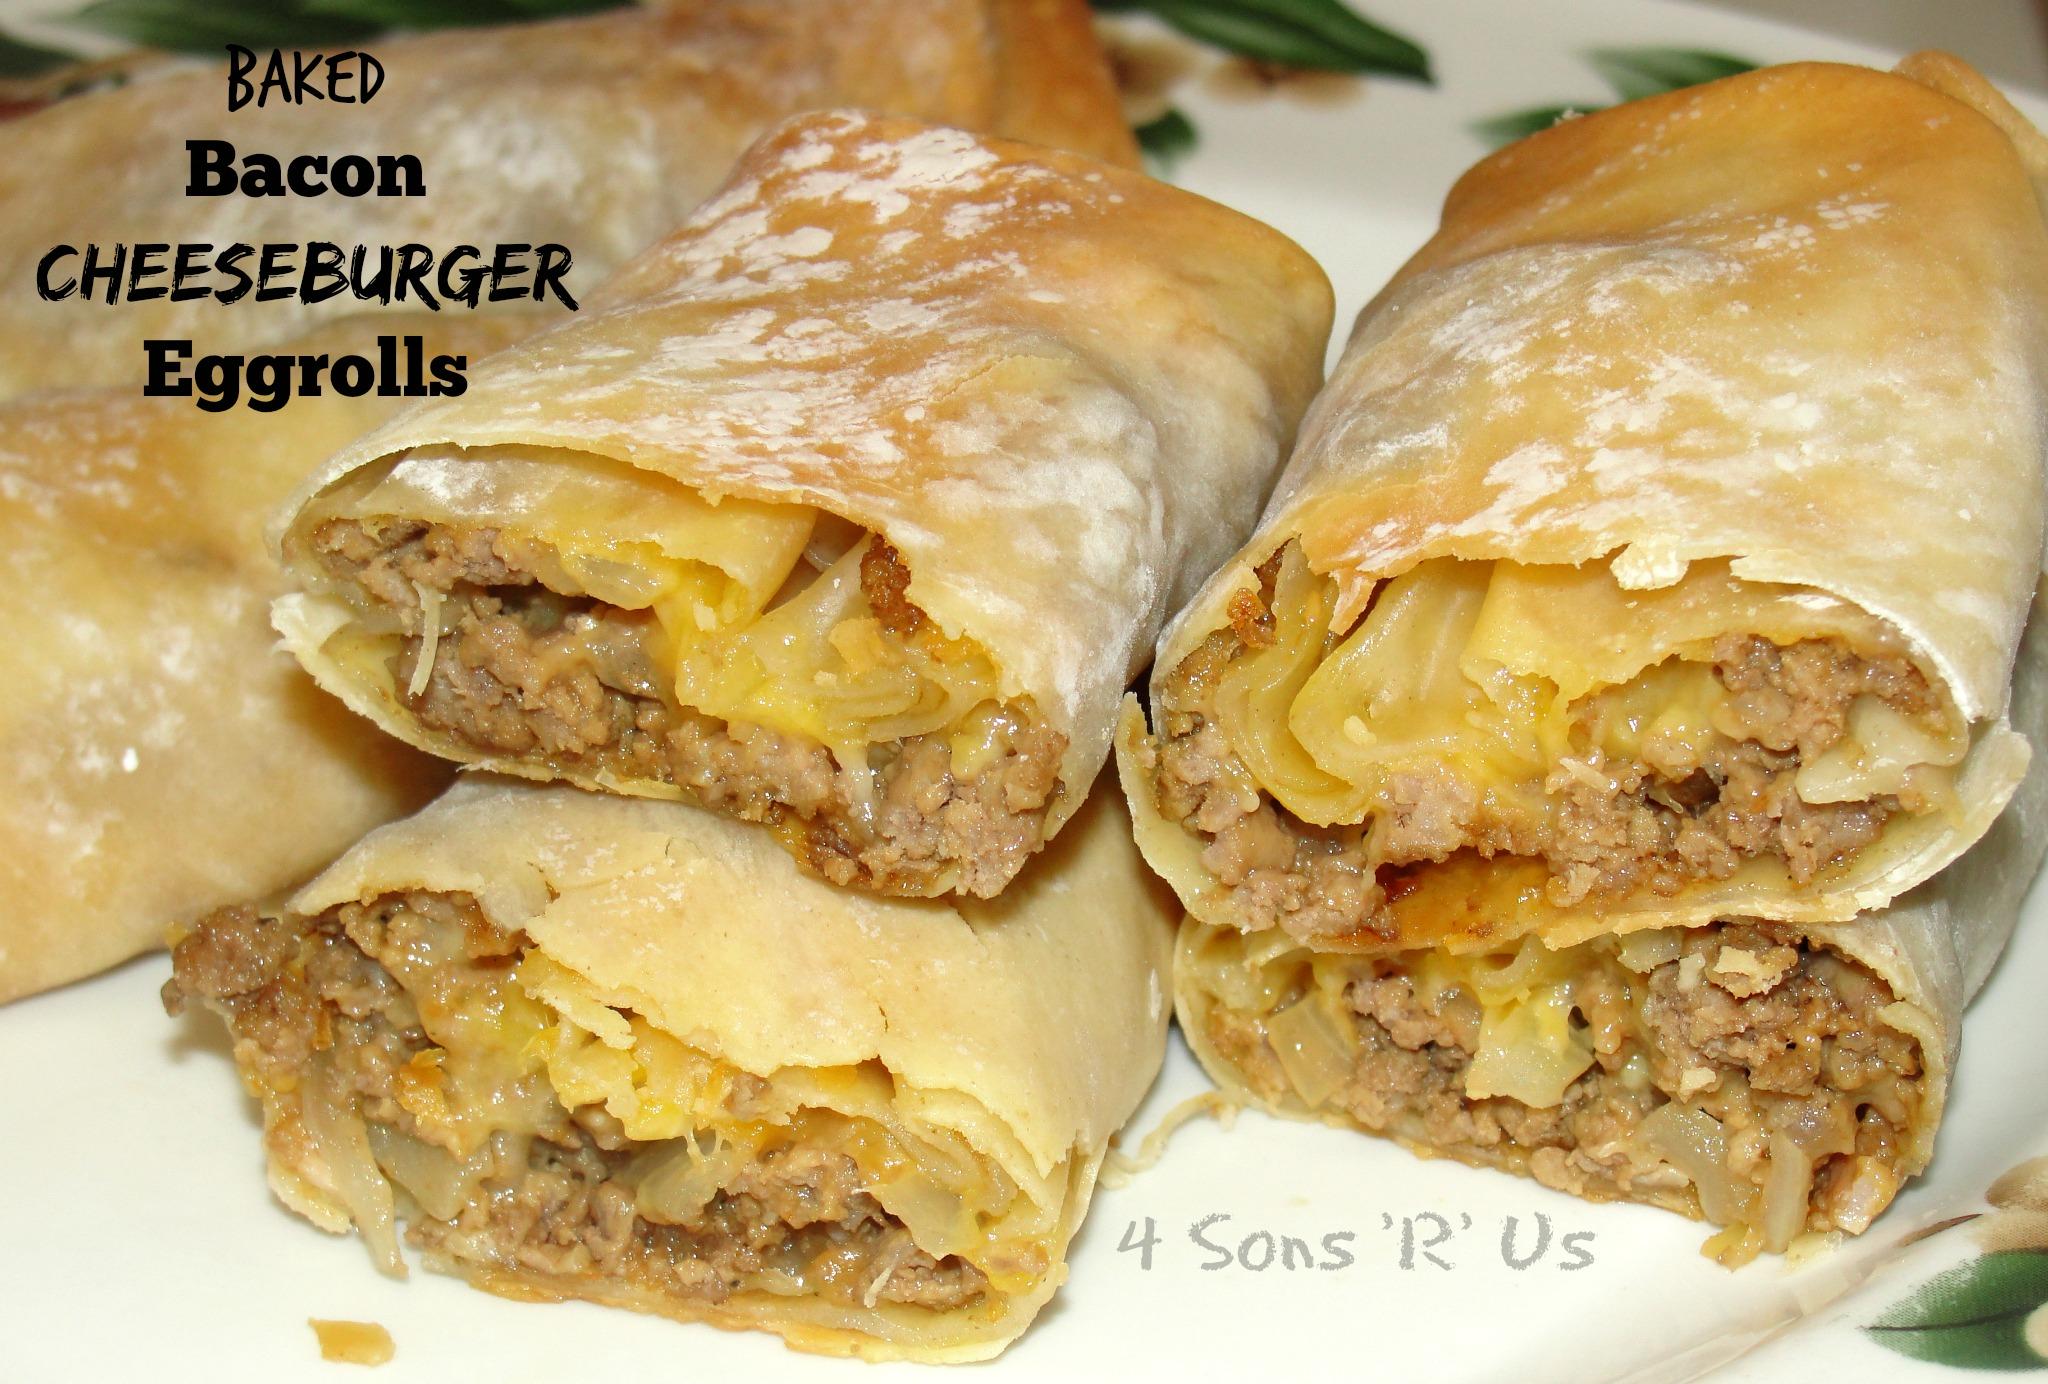 4 Sons R Us Baked Bacon Cheeseburger Eggrolls